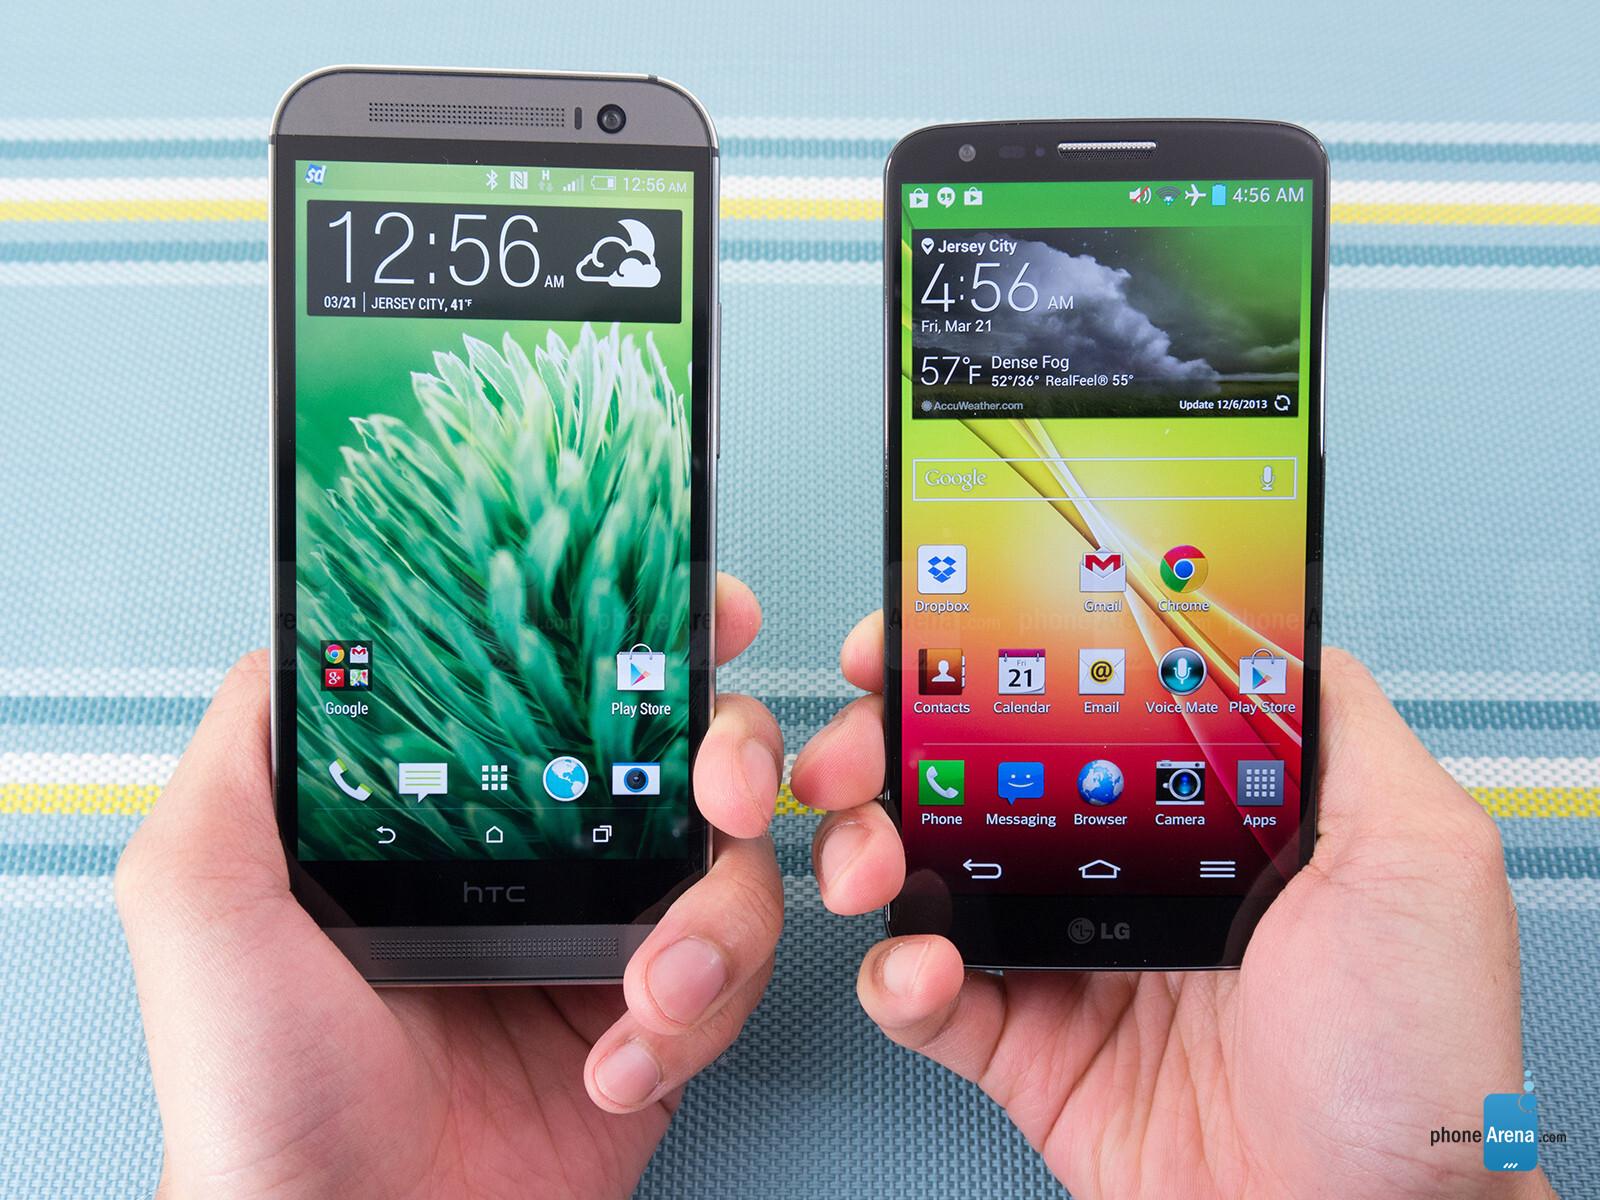 HTC One M8 vs LG G2